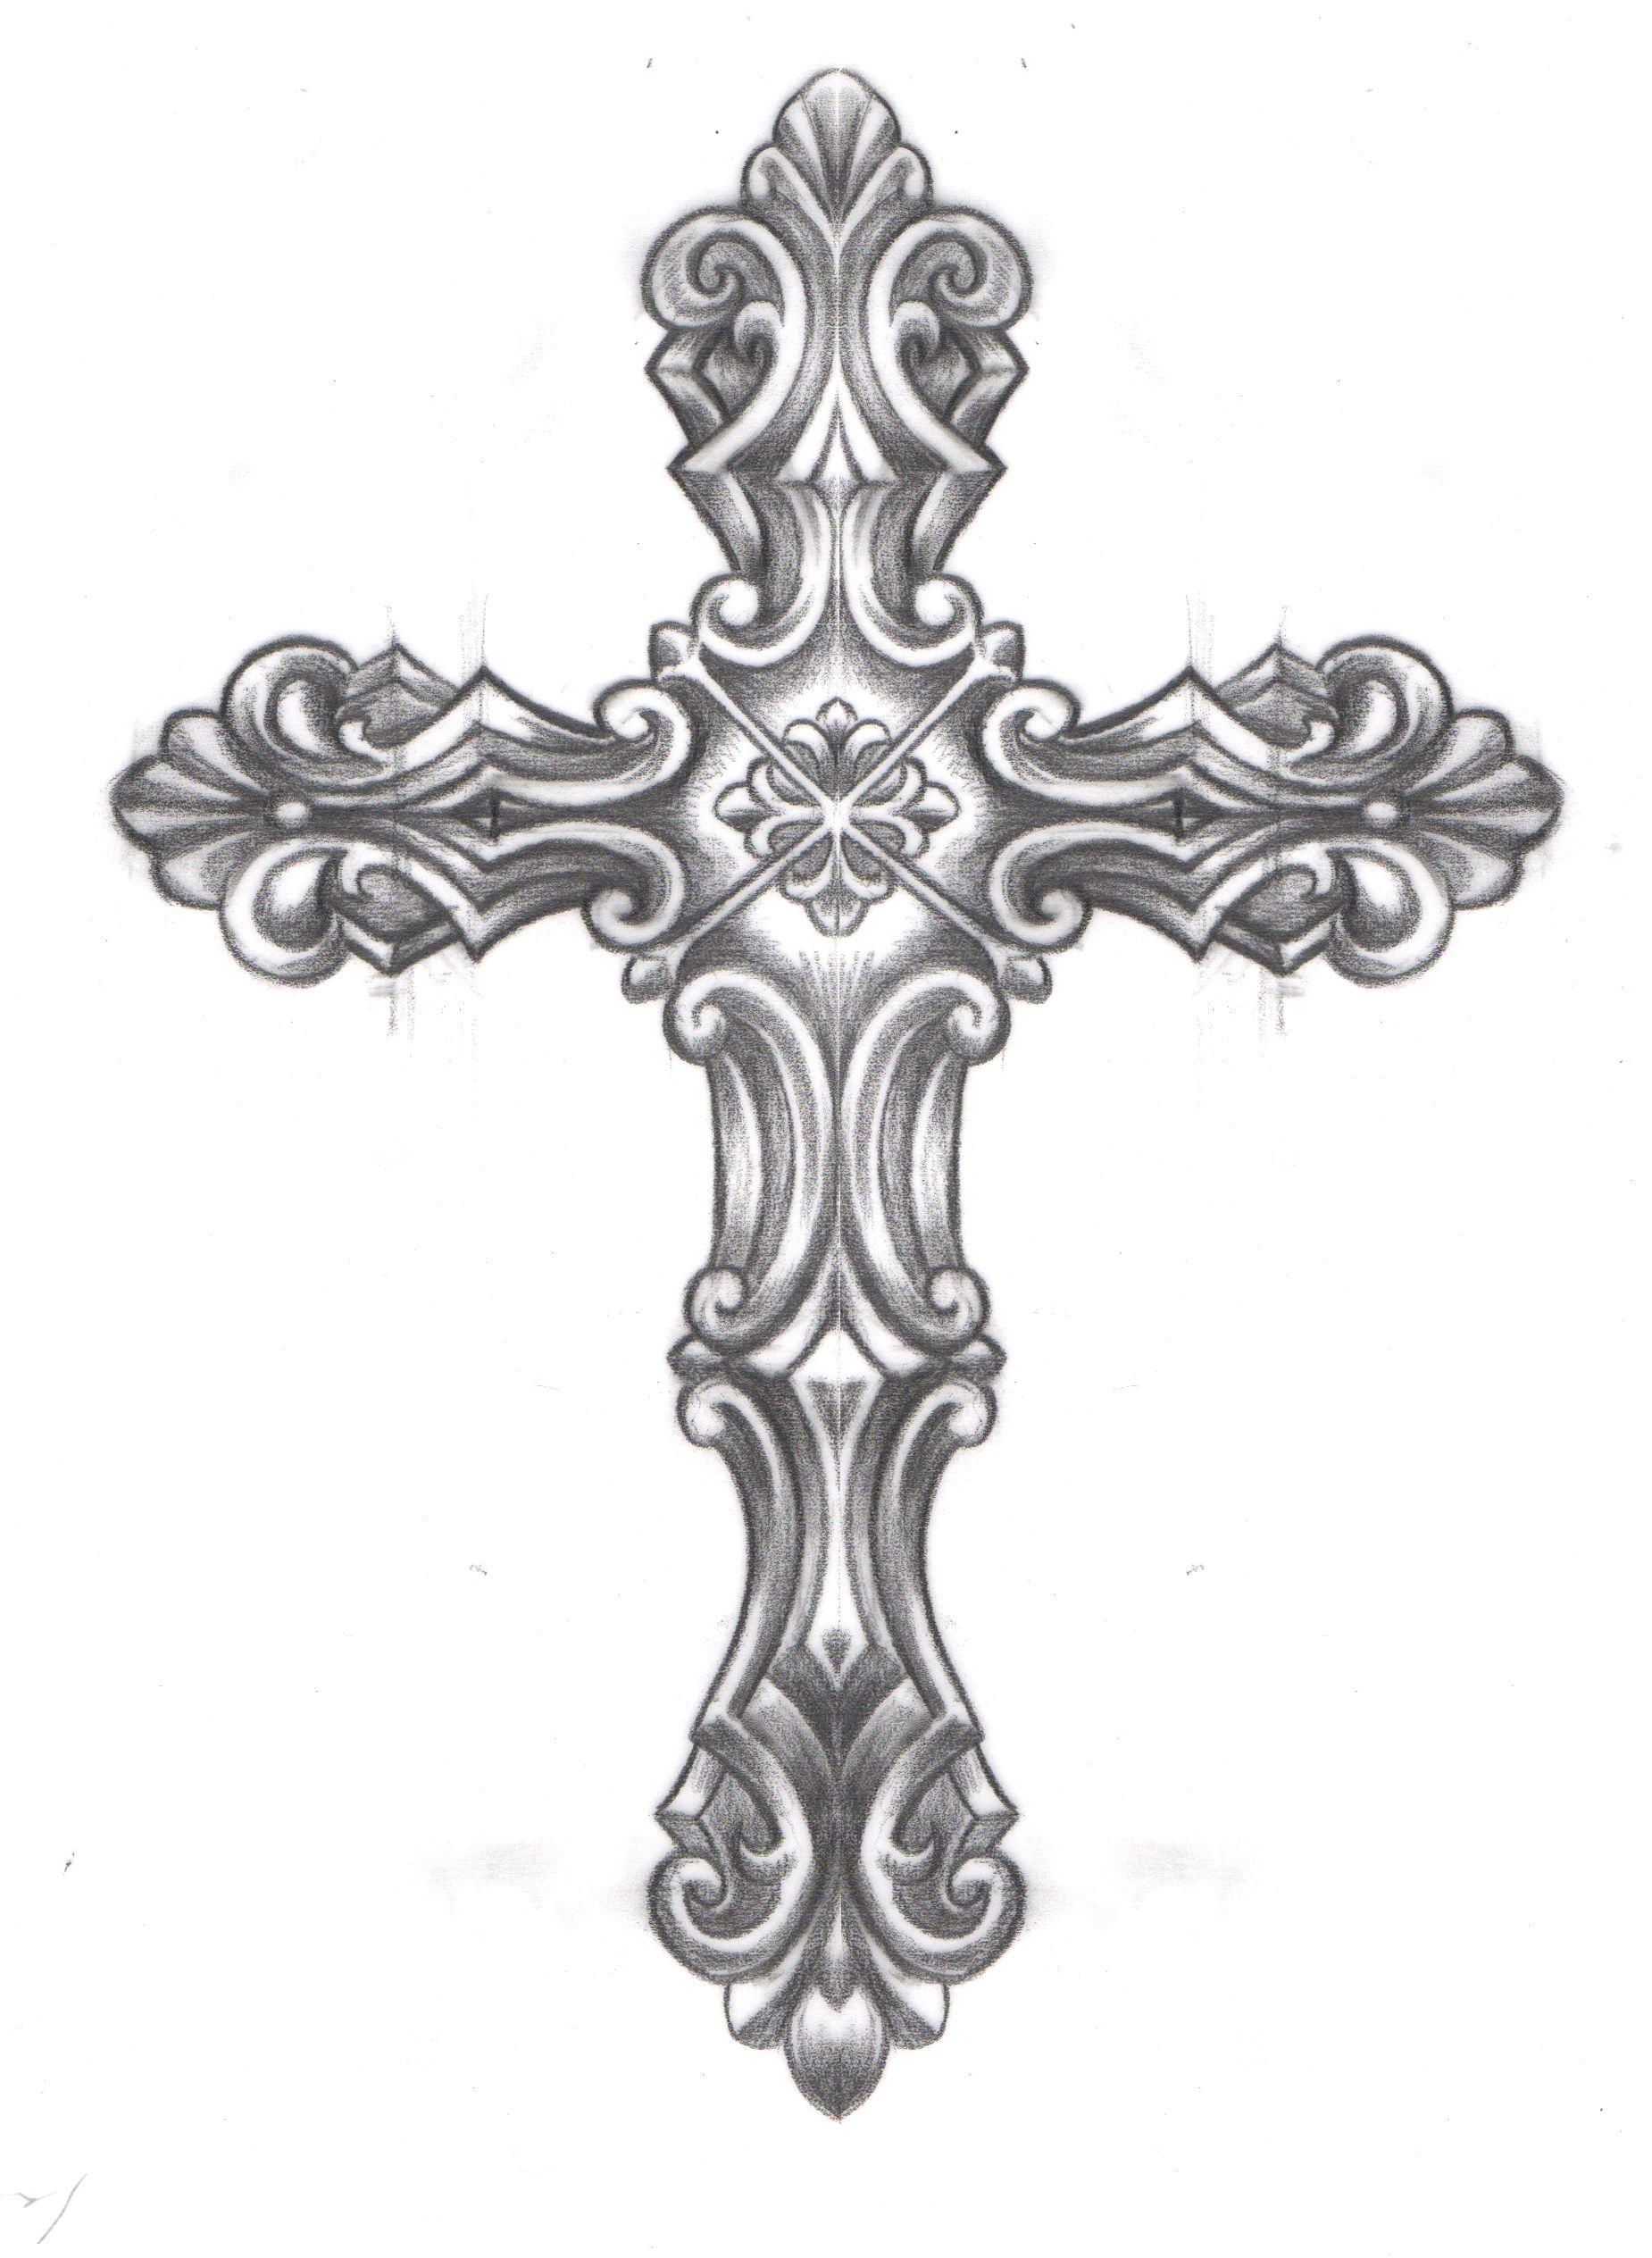 Crucifix clipart ornate cross. Caspian caspiandelooze religious